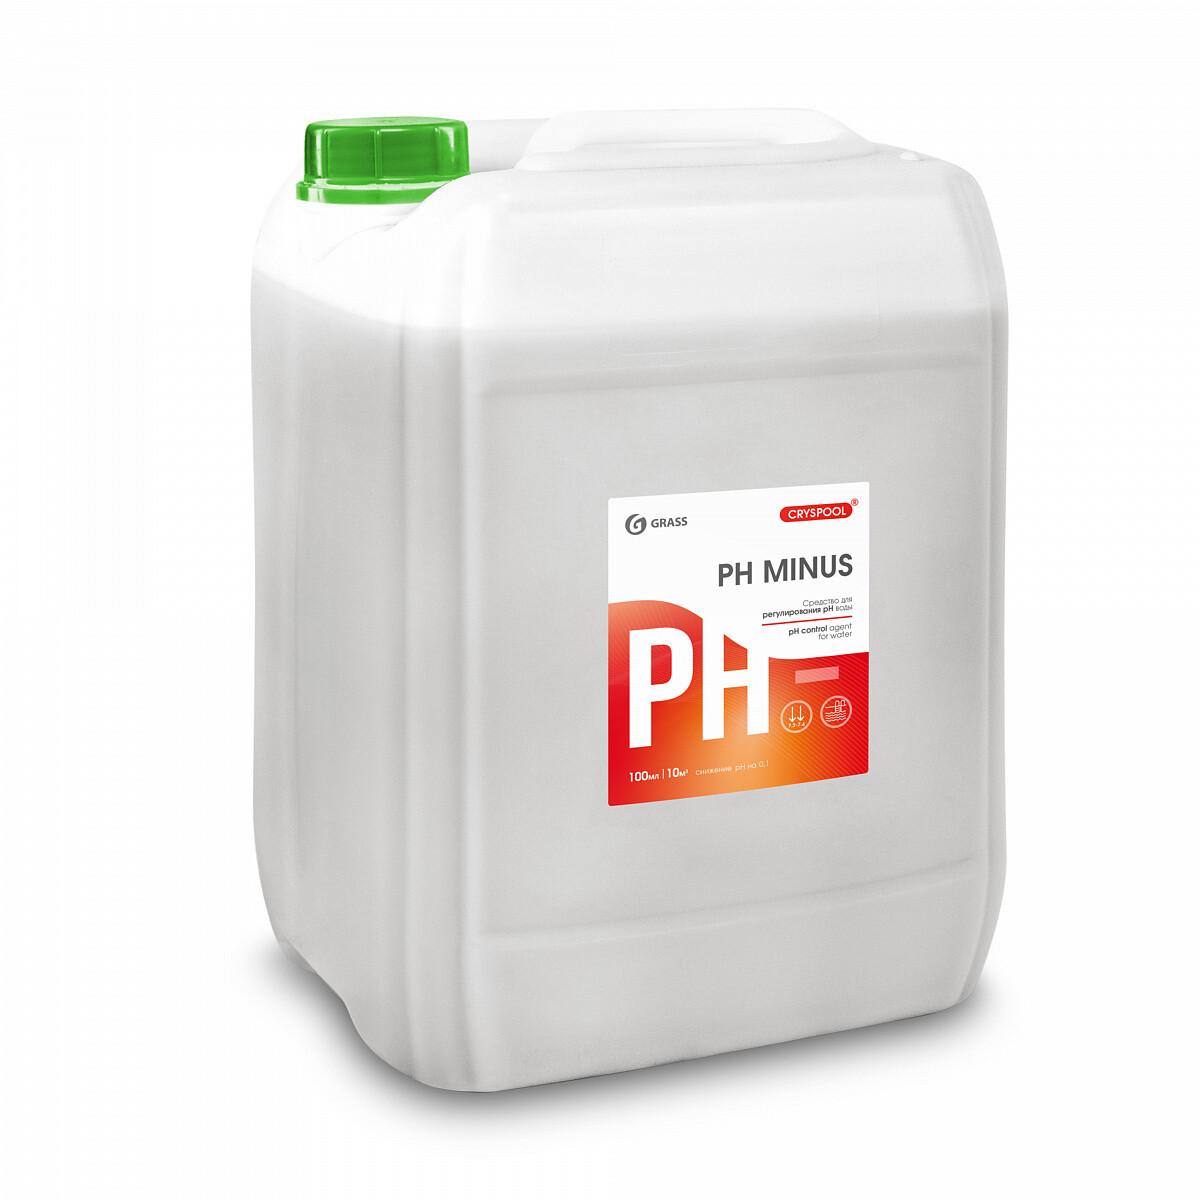 Средство для регулирования pH воды CRYSPOOL pH minus, канистра 35 кг